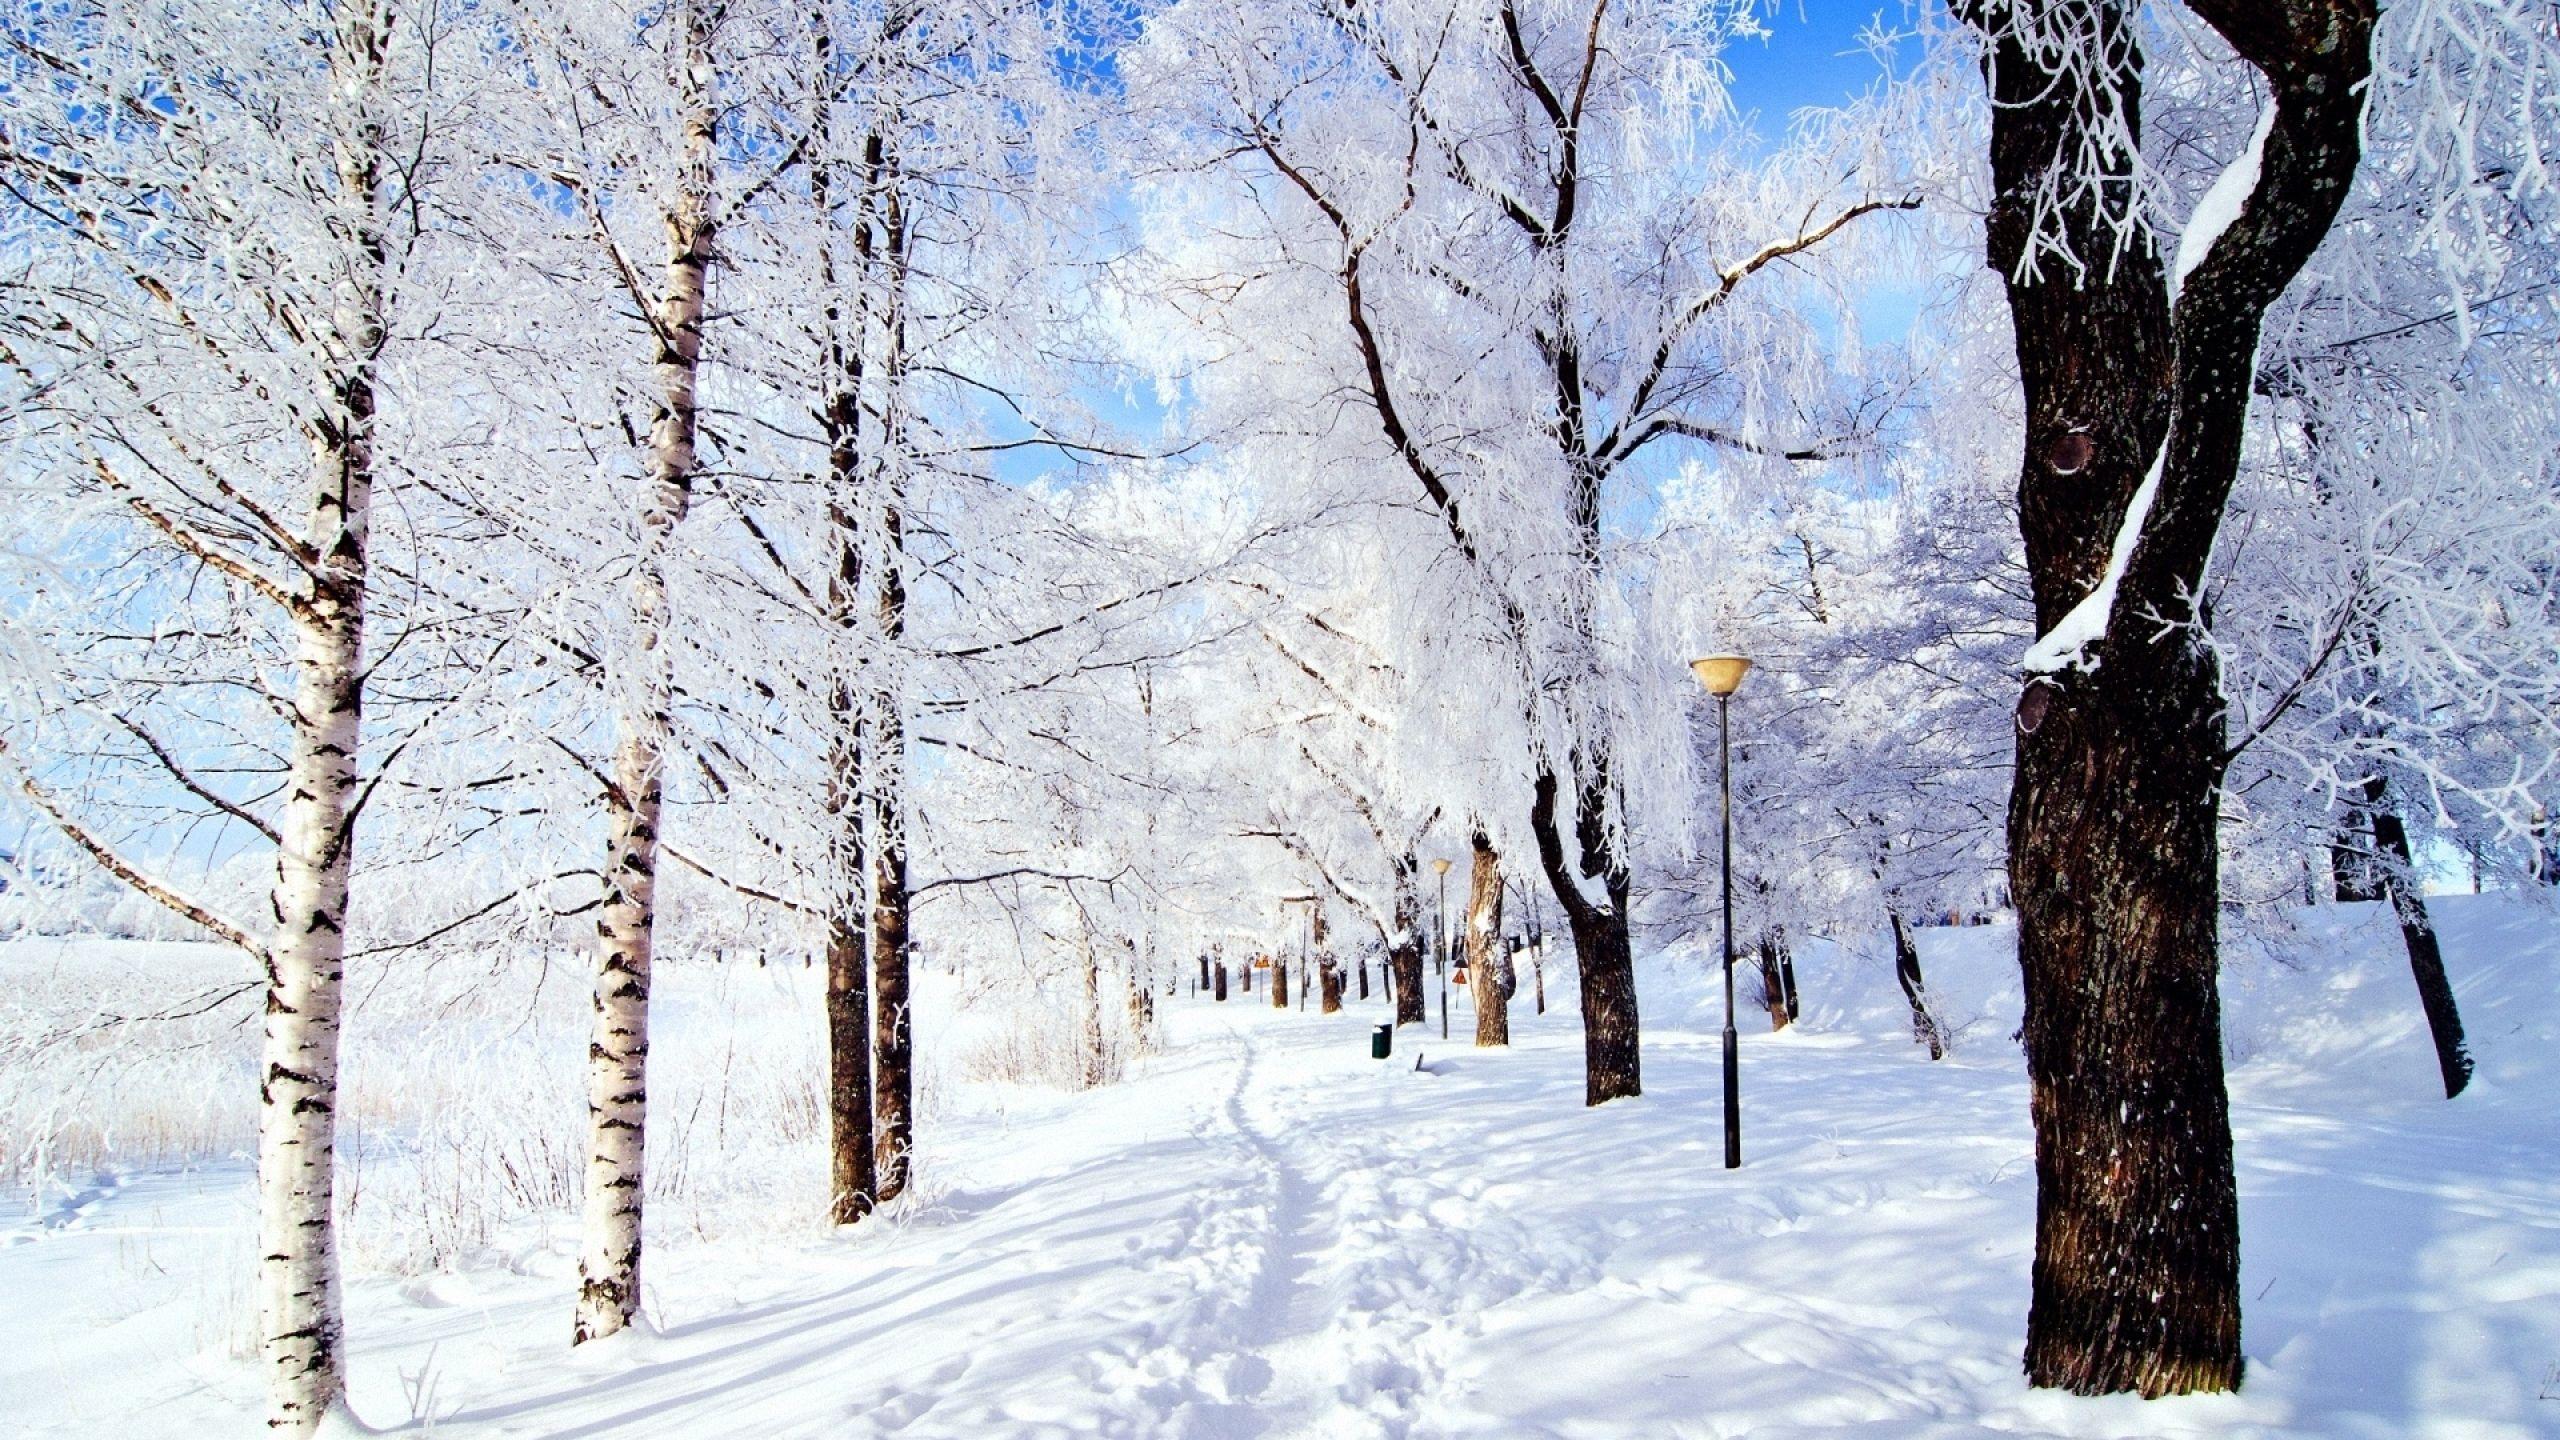 winter christmas mac wallpaper download free mac wallpapers download